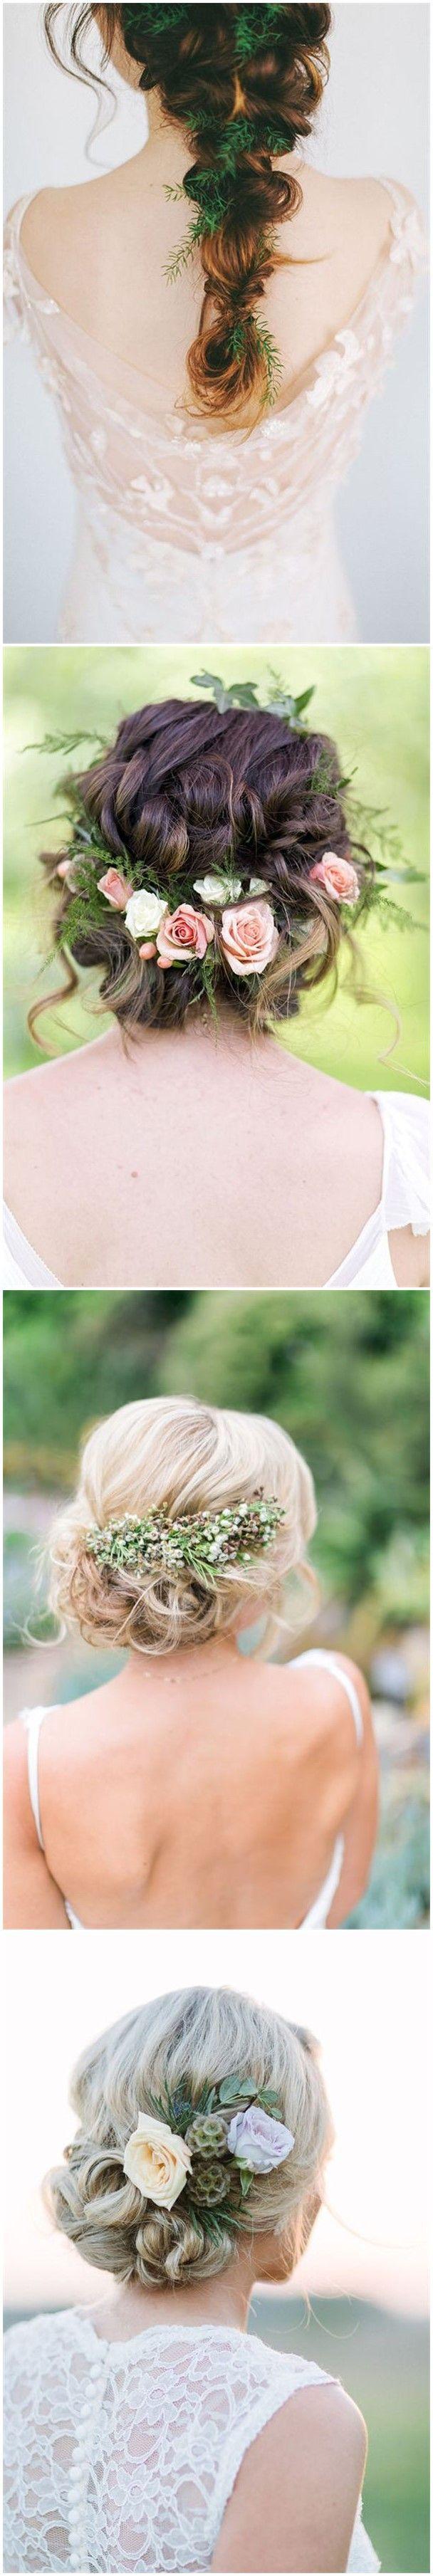 269 best Greenery Wedding images on Pinterest